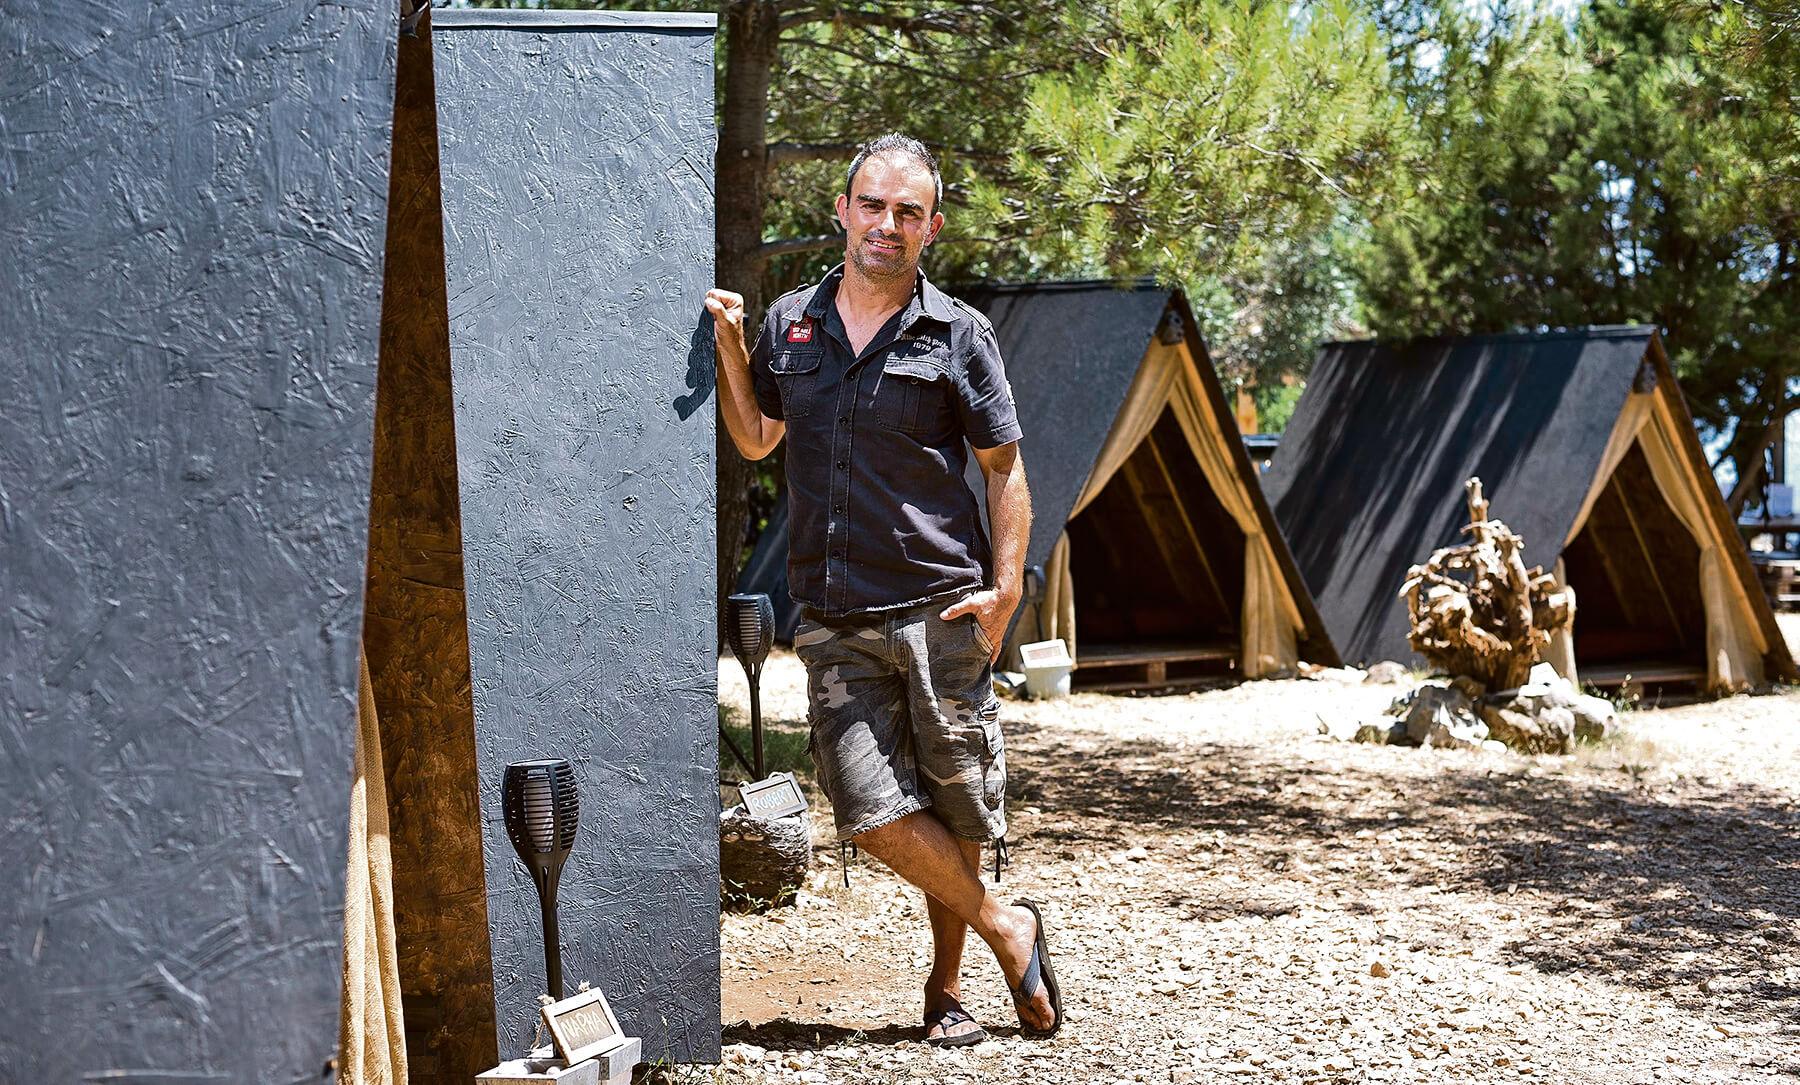 Vlasnik kampa Didier van Bellinghen